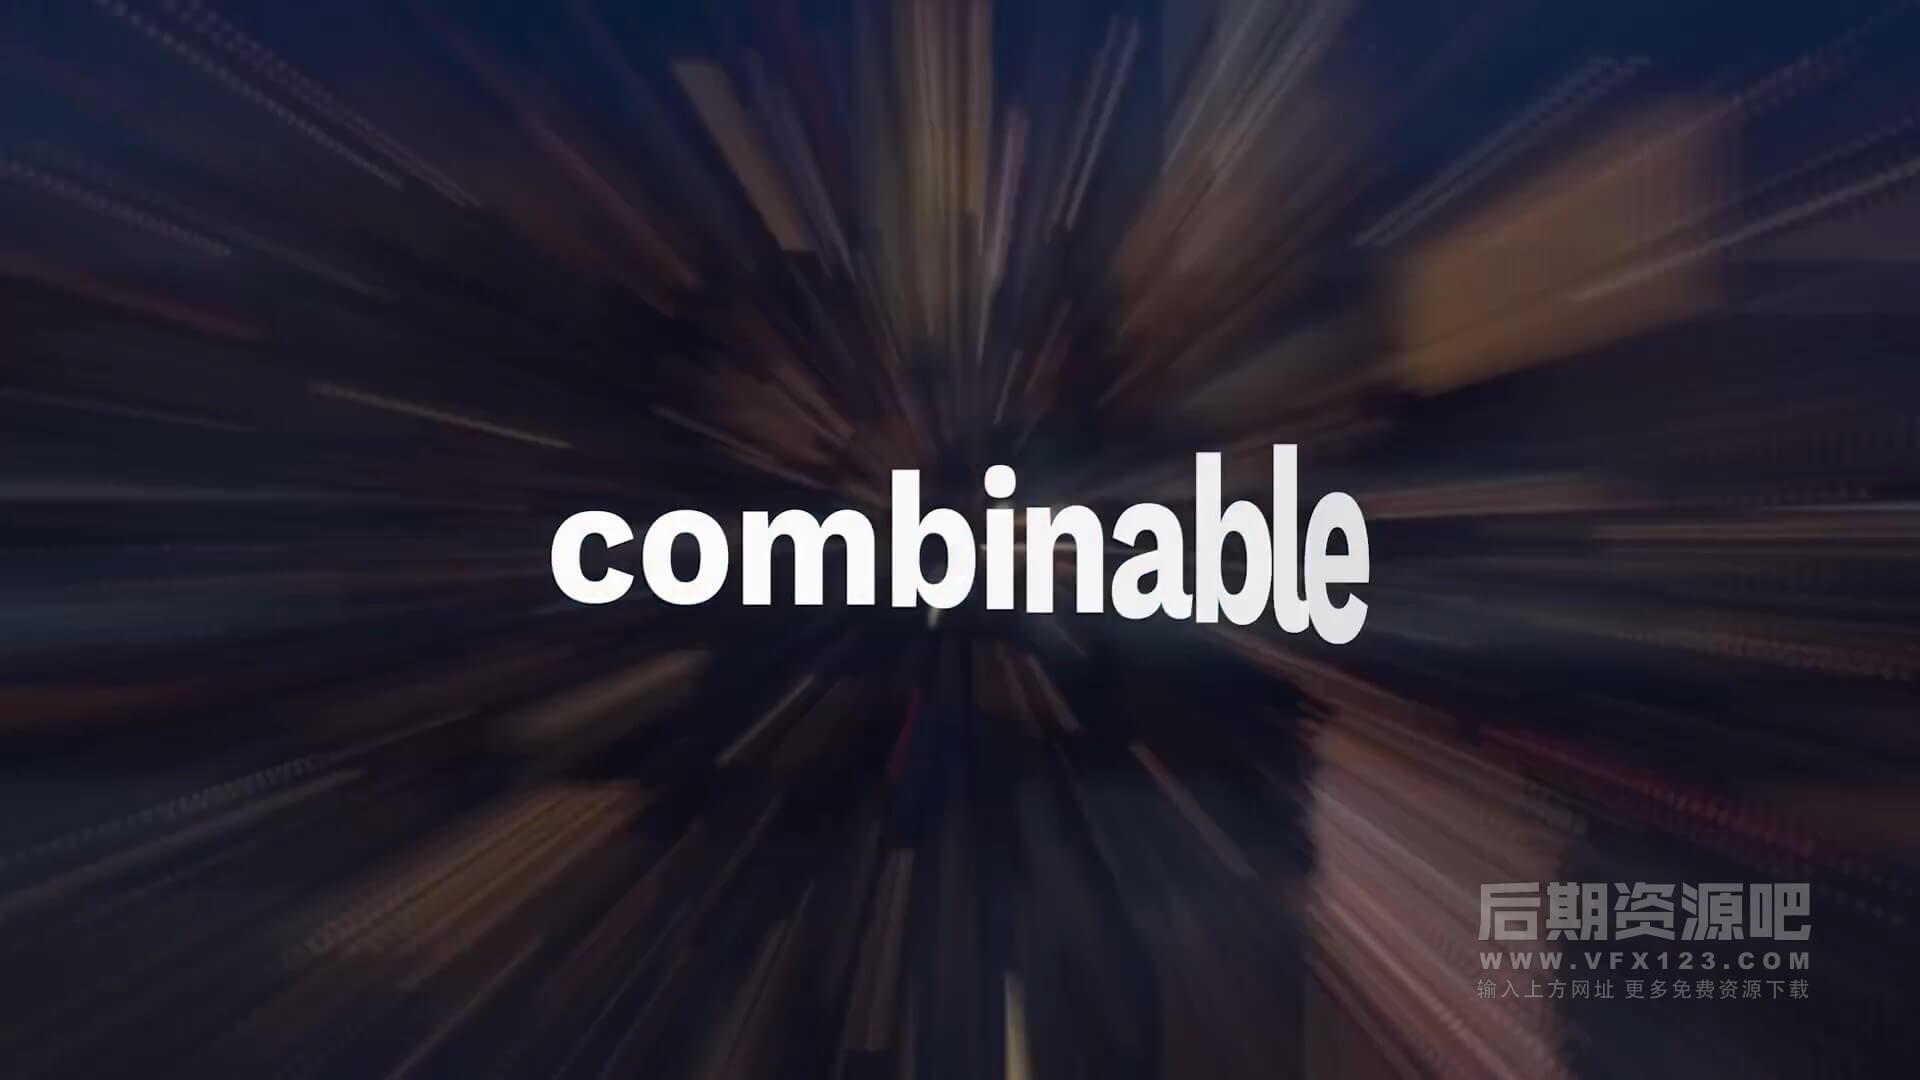 Fcpx标题插件 40组动感活力节奏快闪运动文字标题动画预设 mTitle Kinetic